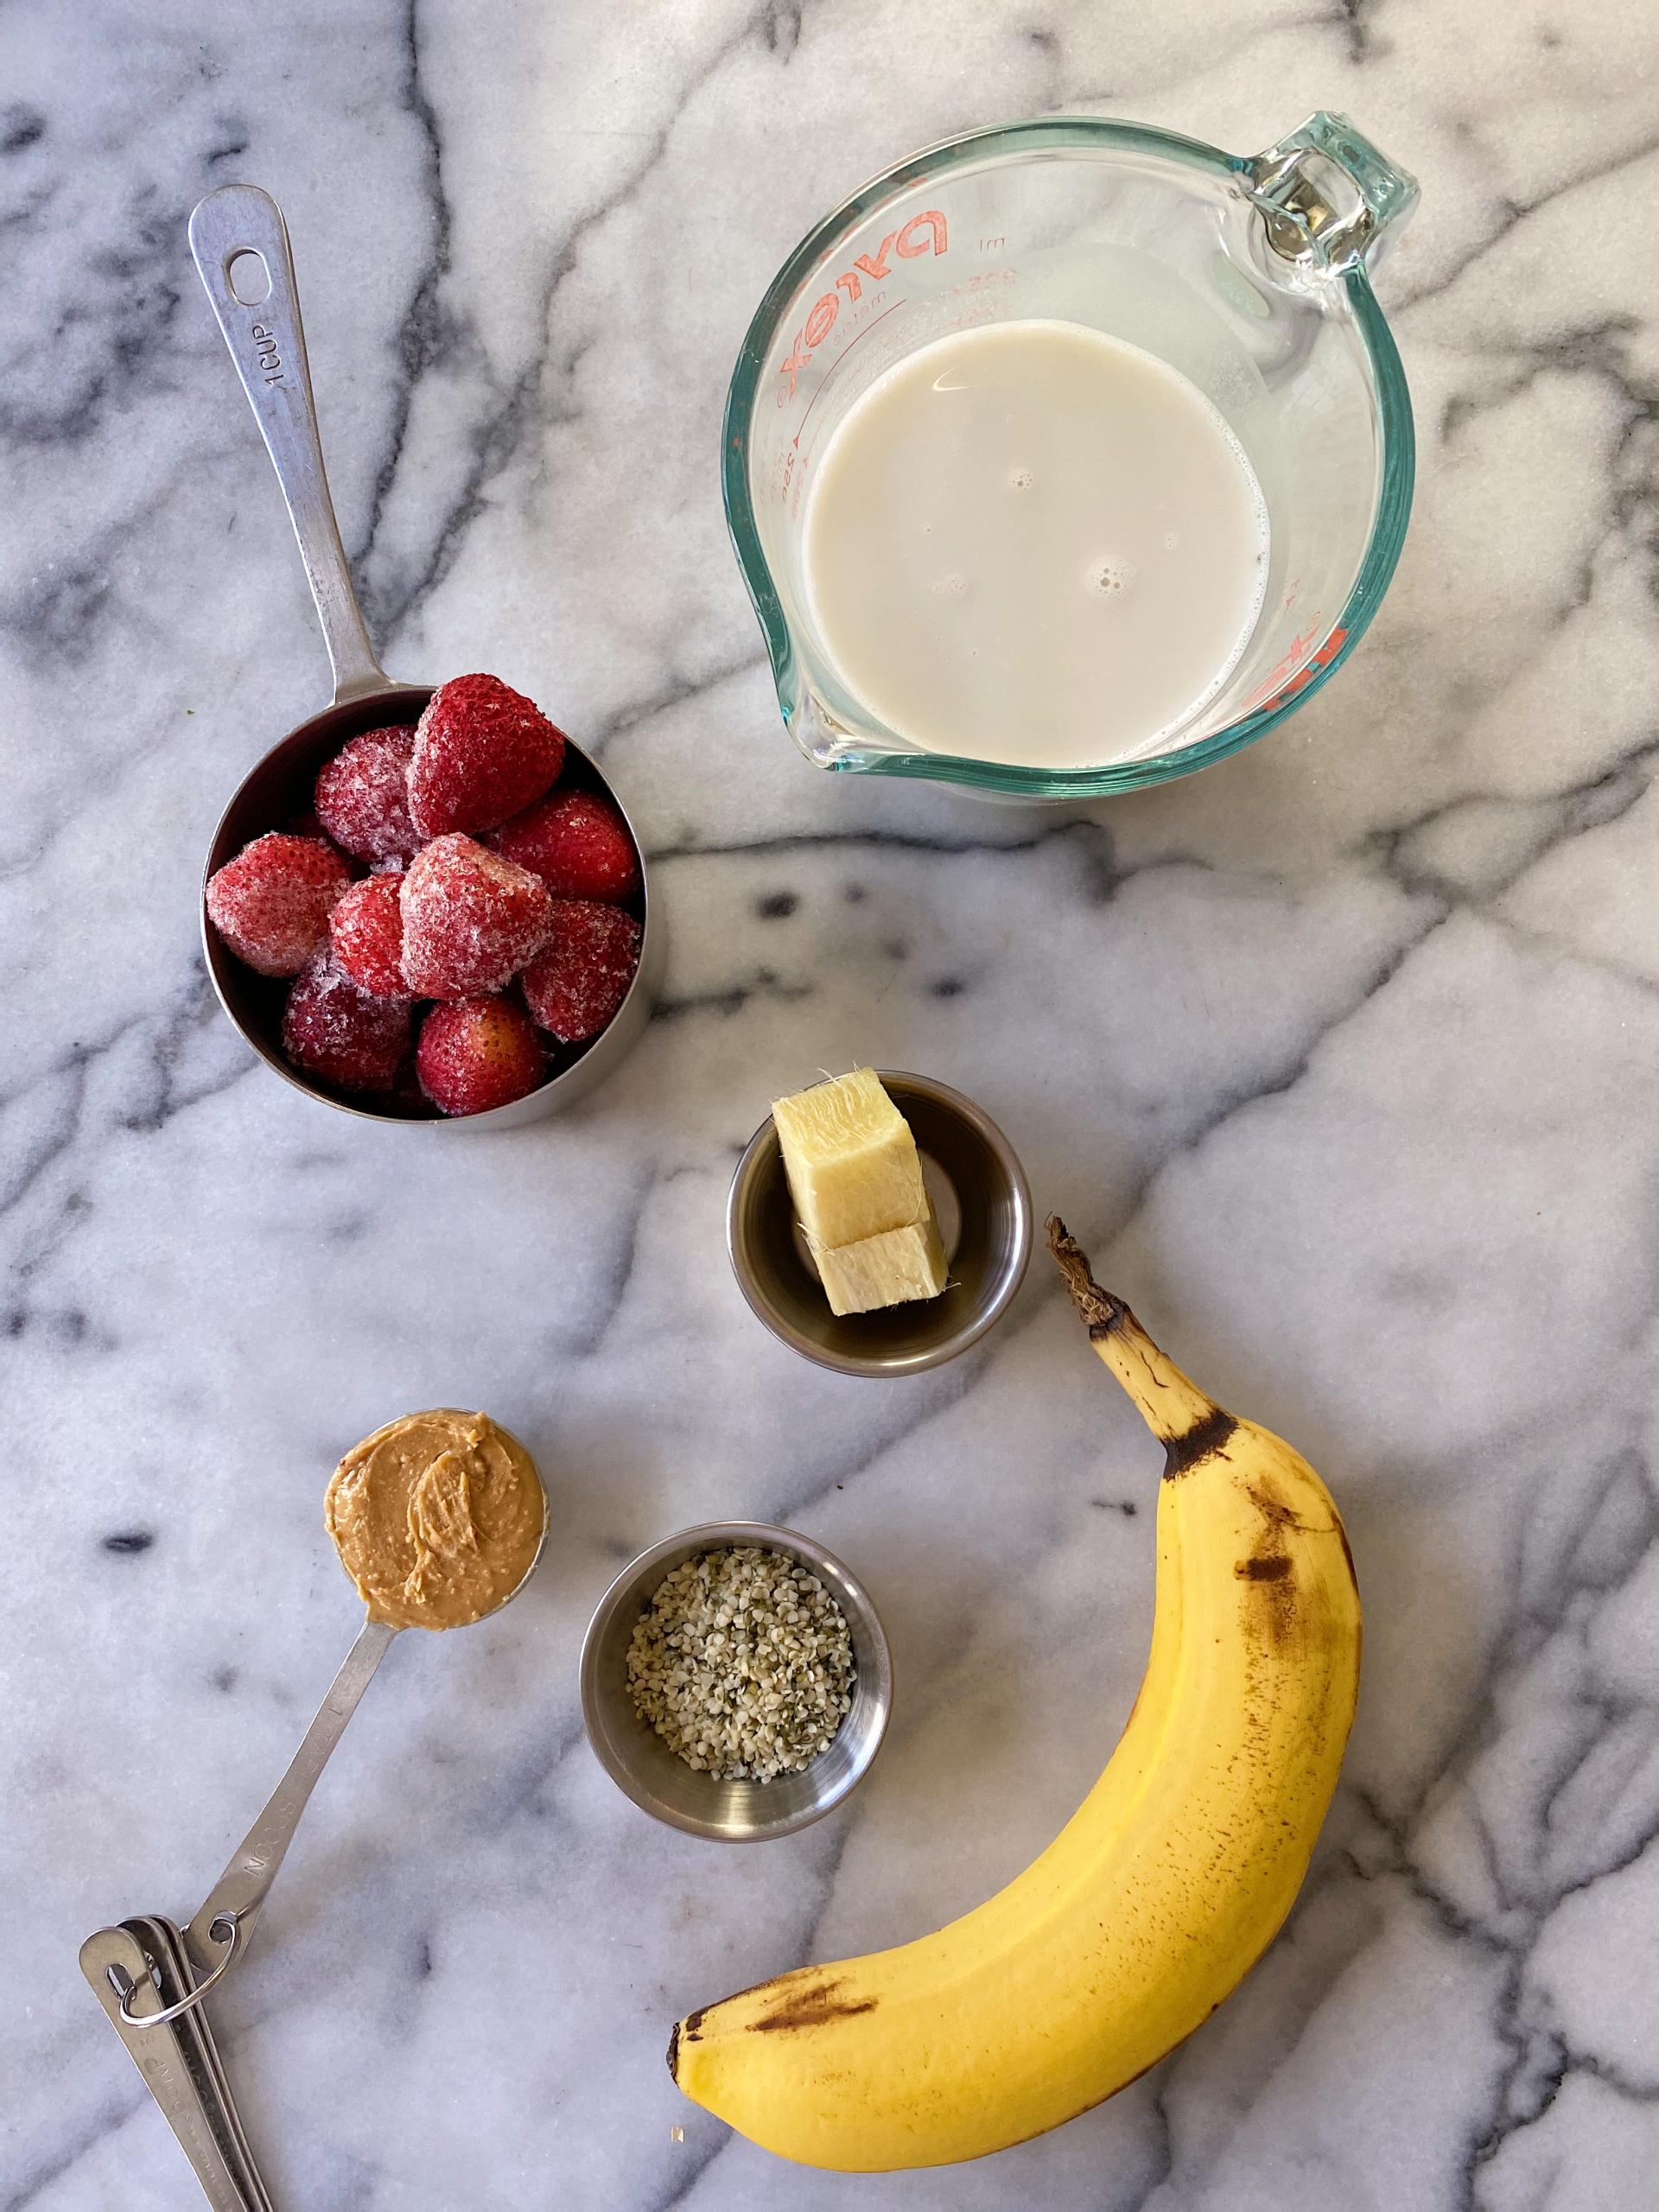 Blueberry Banana Smoothie gluten free easy #glutenfreerecipes www.healthygfamily.com